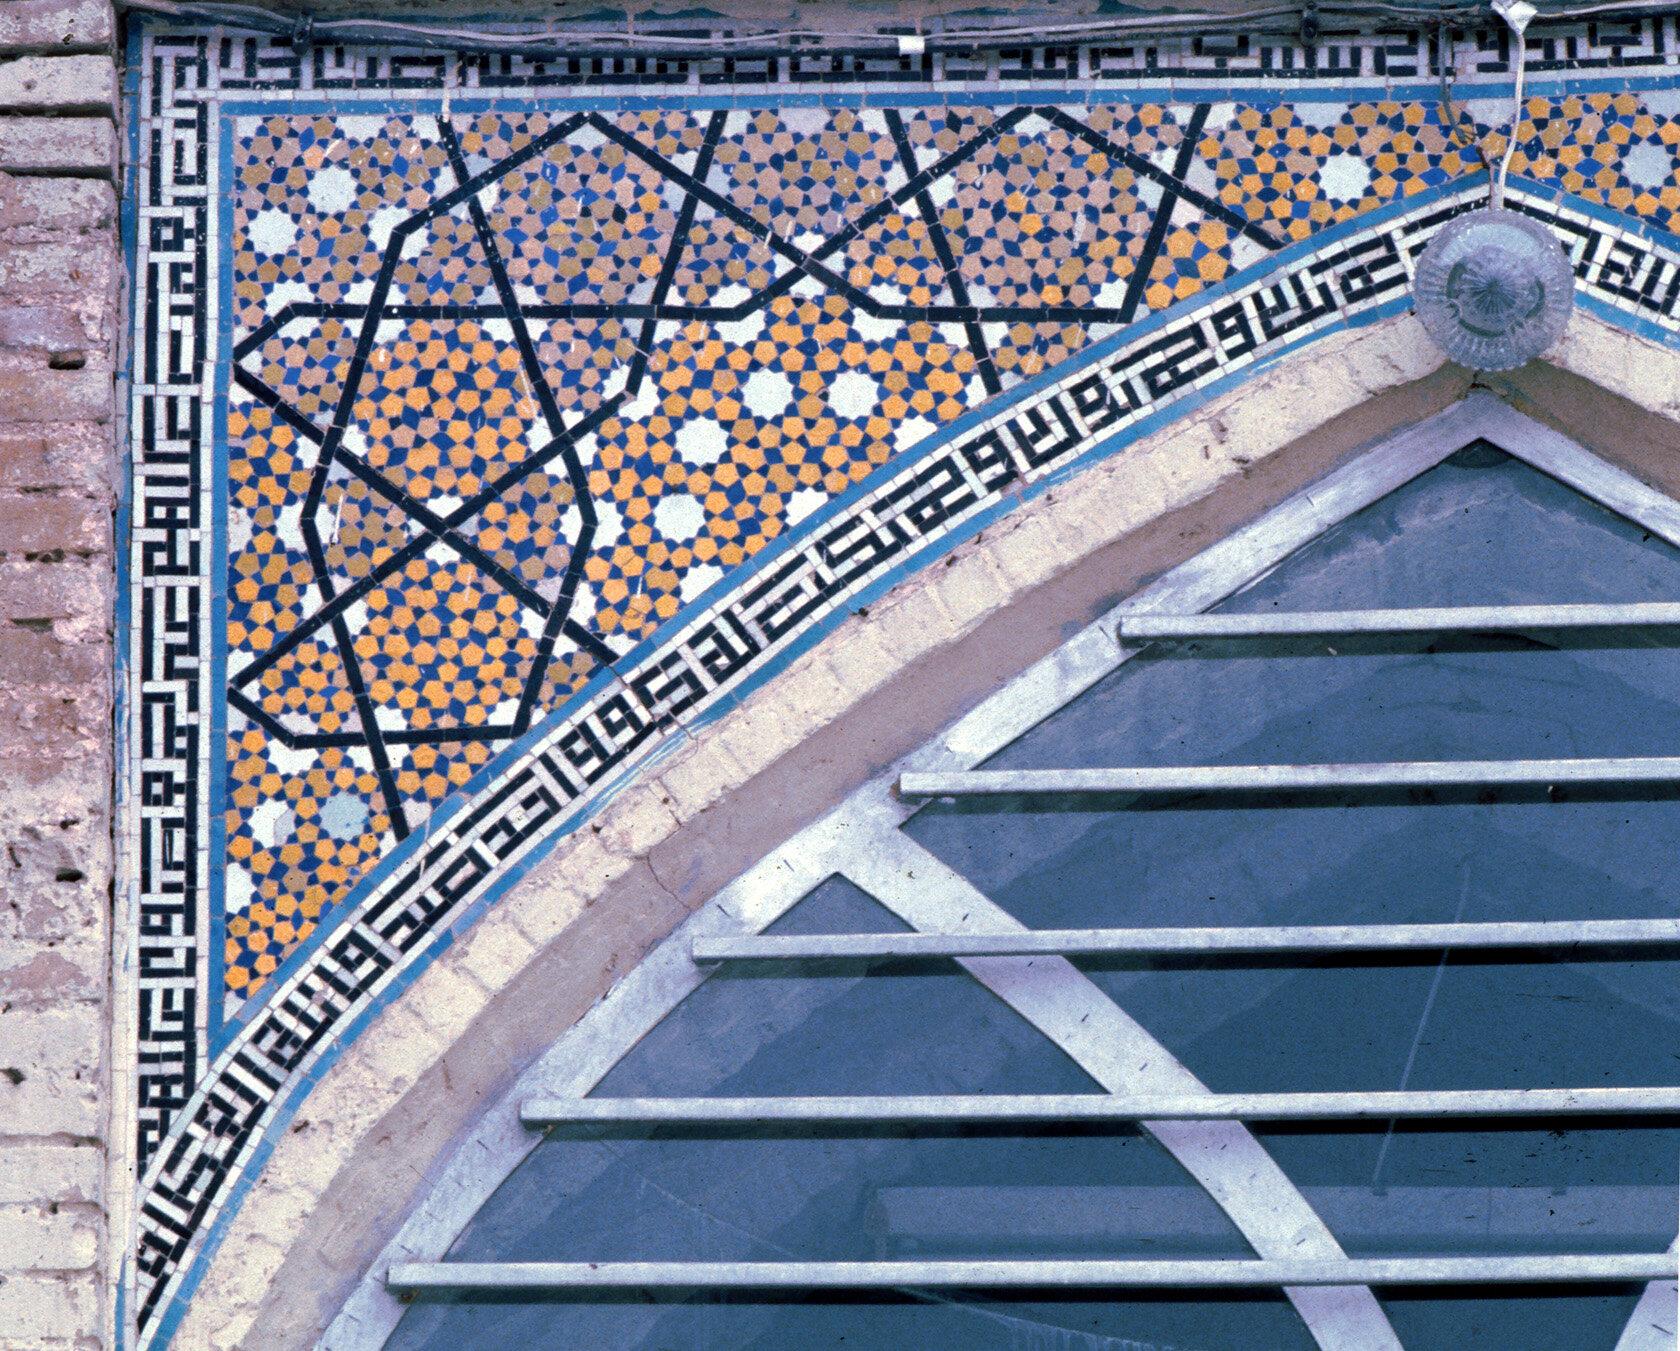 Mosaic tiling at the Darb-e-Imam in Isfahan, Iran  Wade Photography IRA0837:  https://patterninislamicart.com/archive/1/874